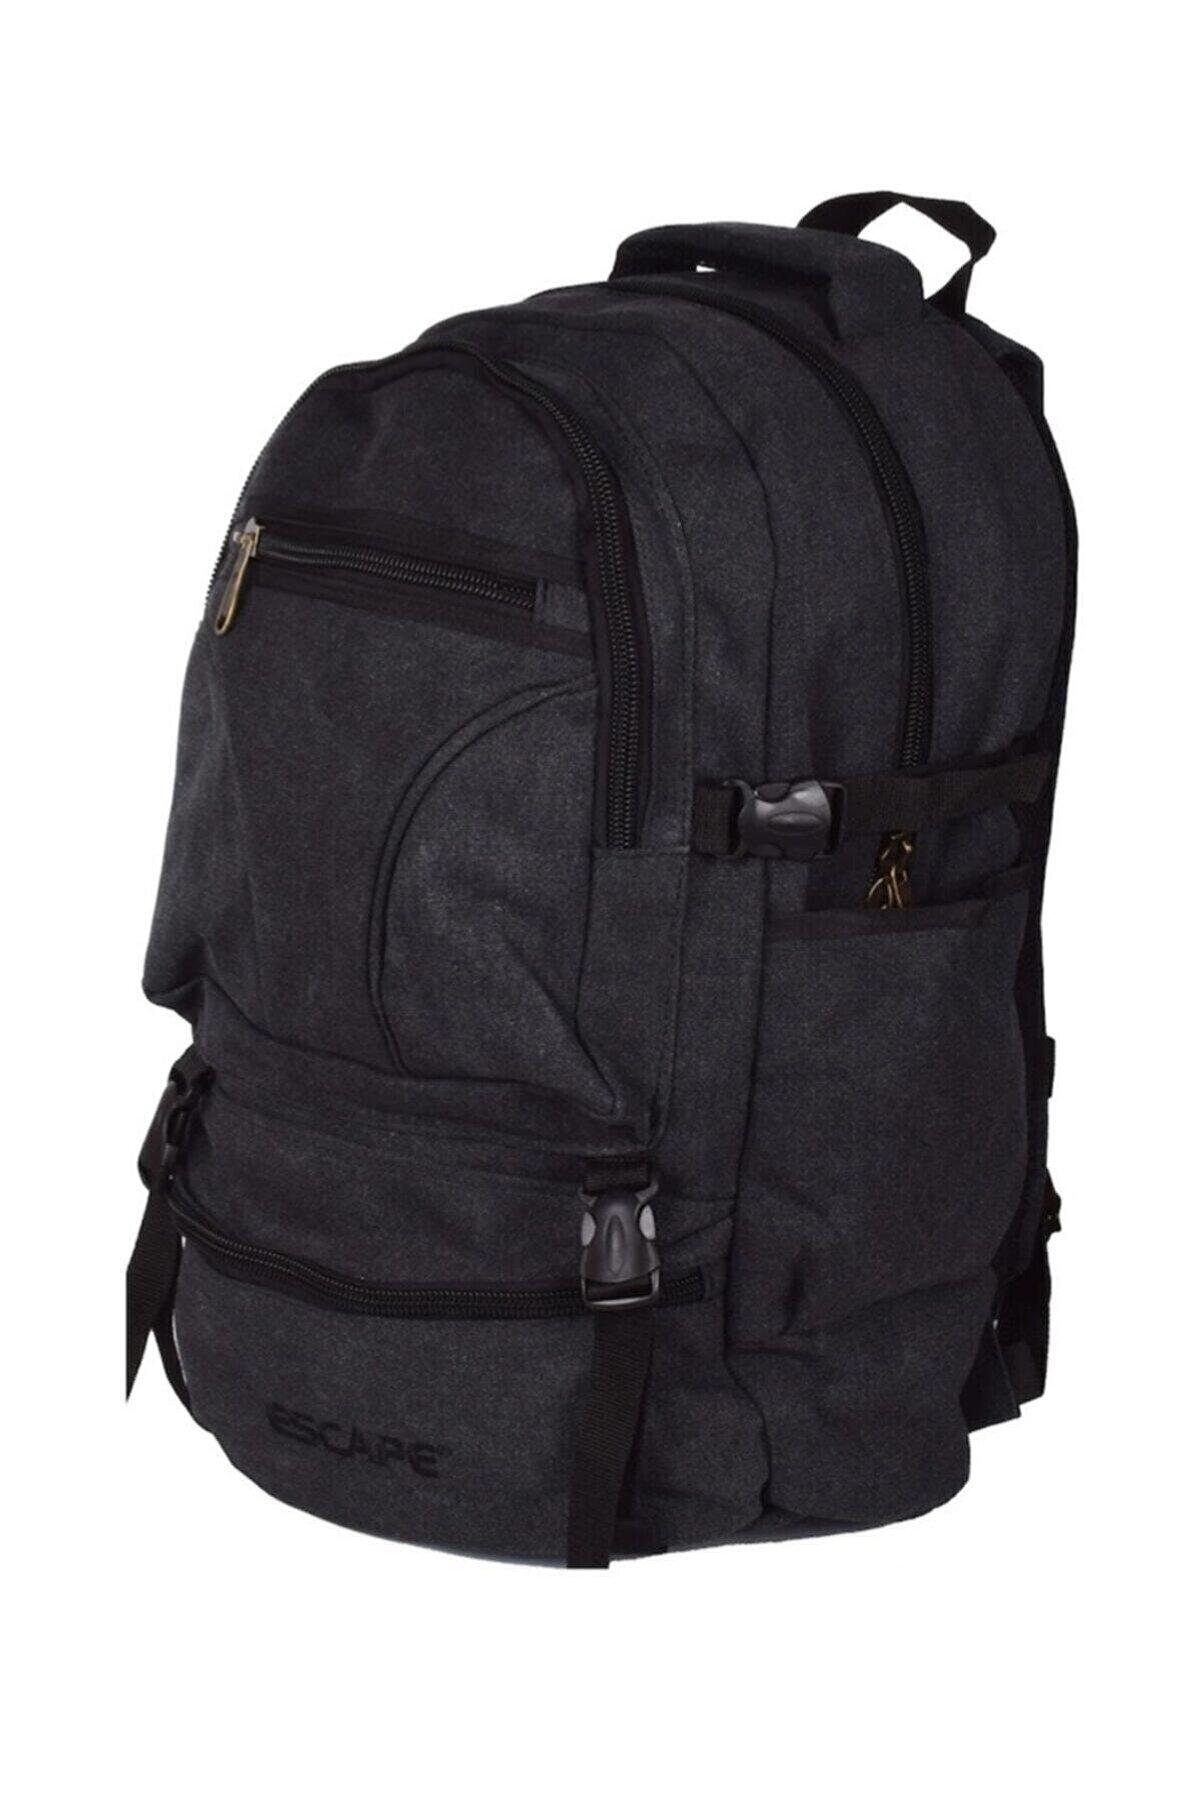 ESCAPE Siyah Dağcı Sırt Çantası Kanvas Kumaş 50lt 501 Outdoor Çanta